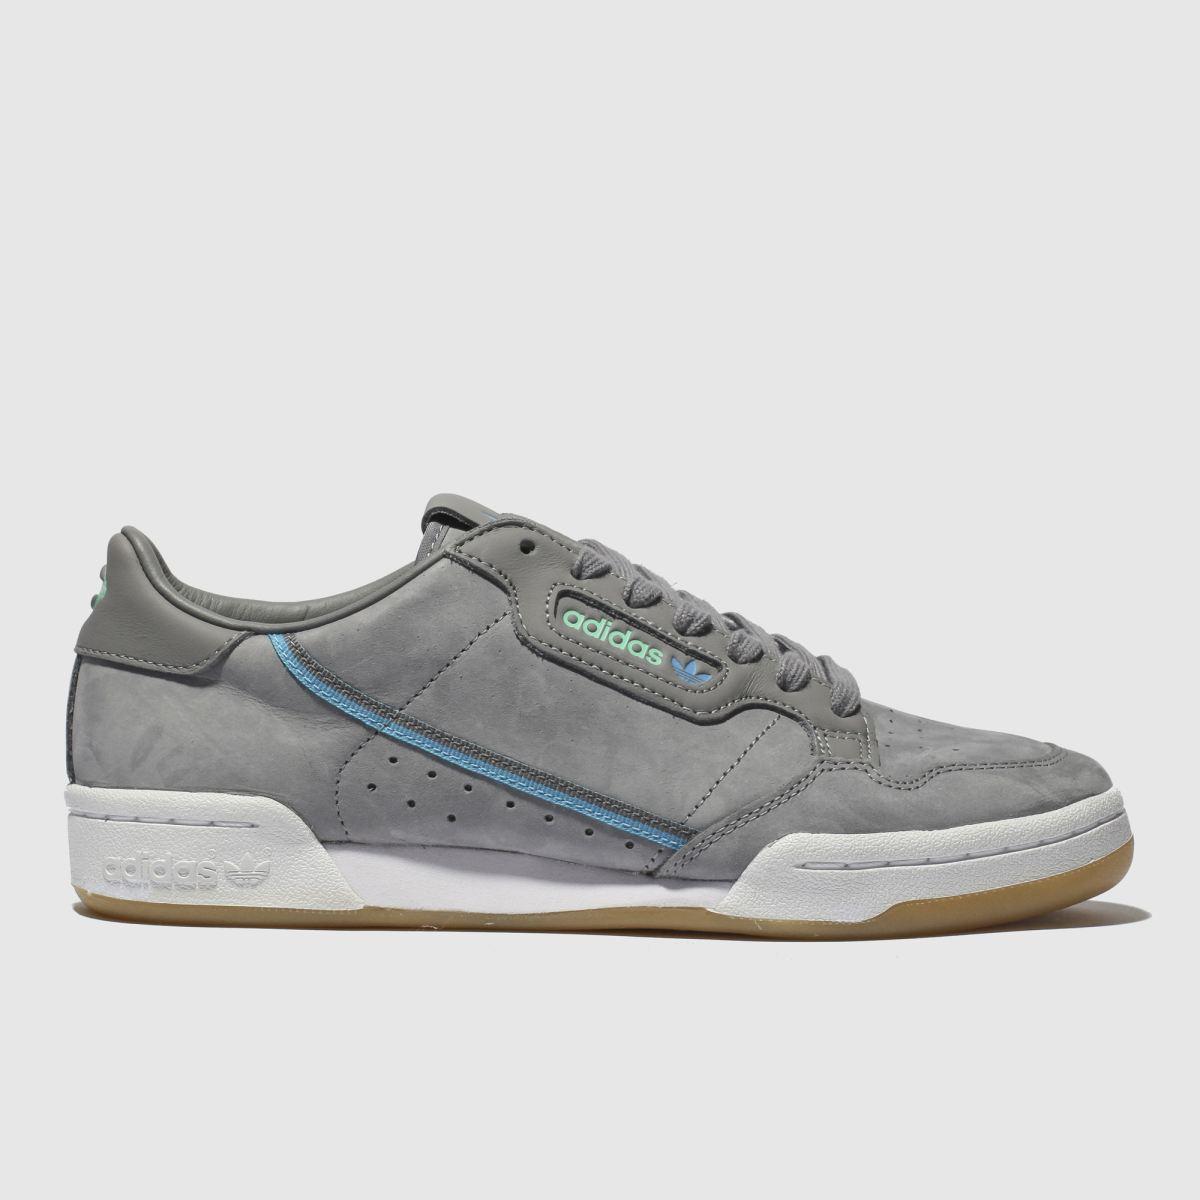 Adidas Dark Grey Continental 80 X Tfl Trainers